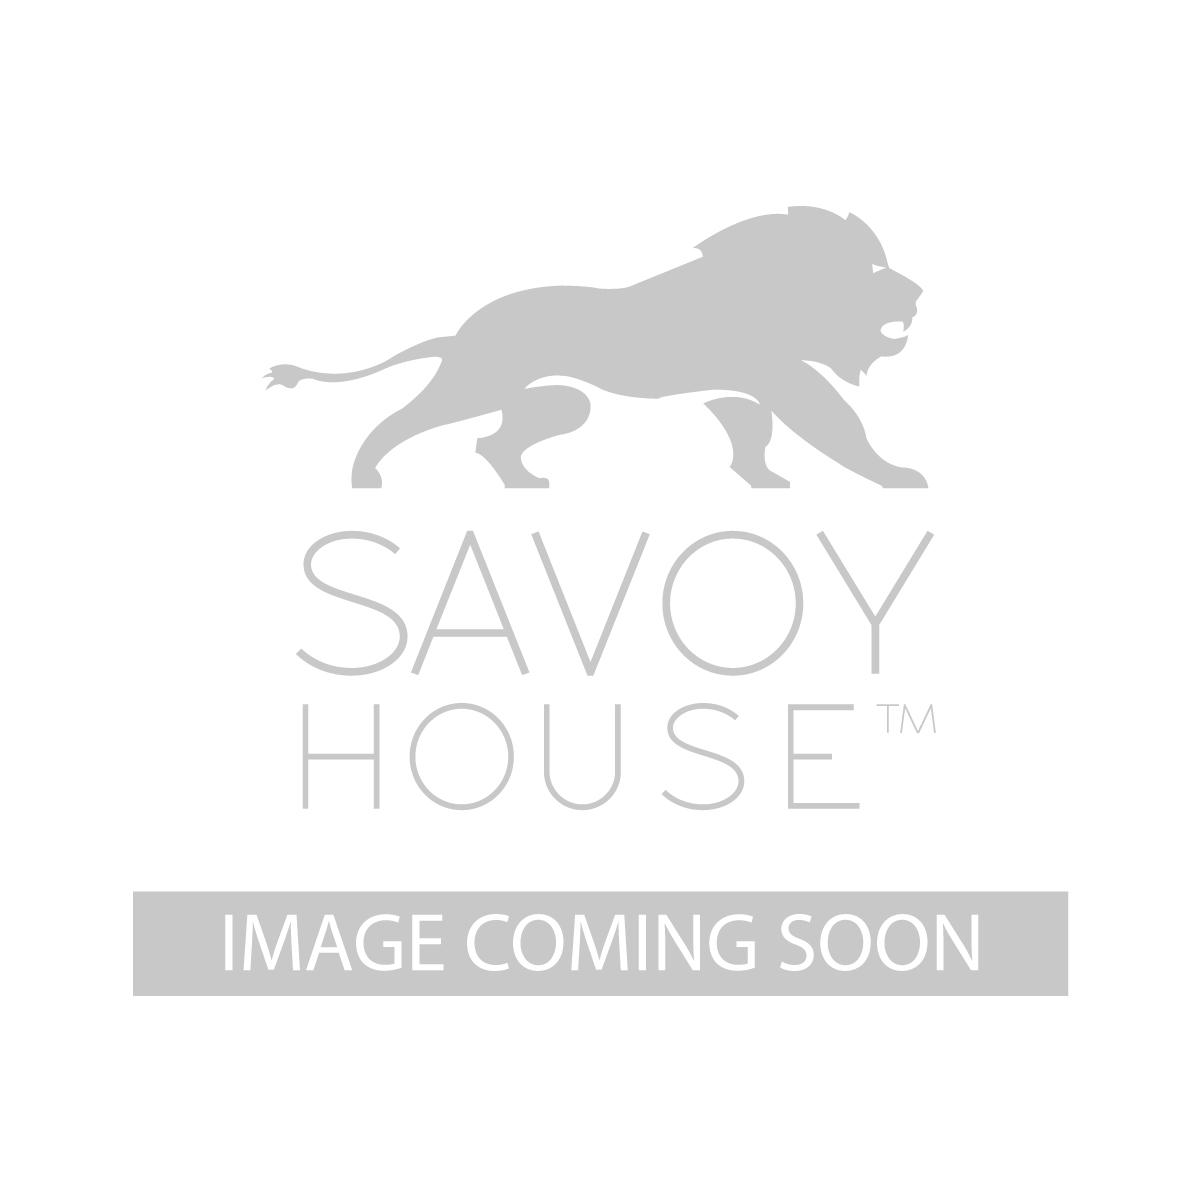 8 1780 3 111 lansing 3 light bath bar by savoy house for Www savoyhouse com